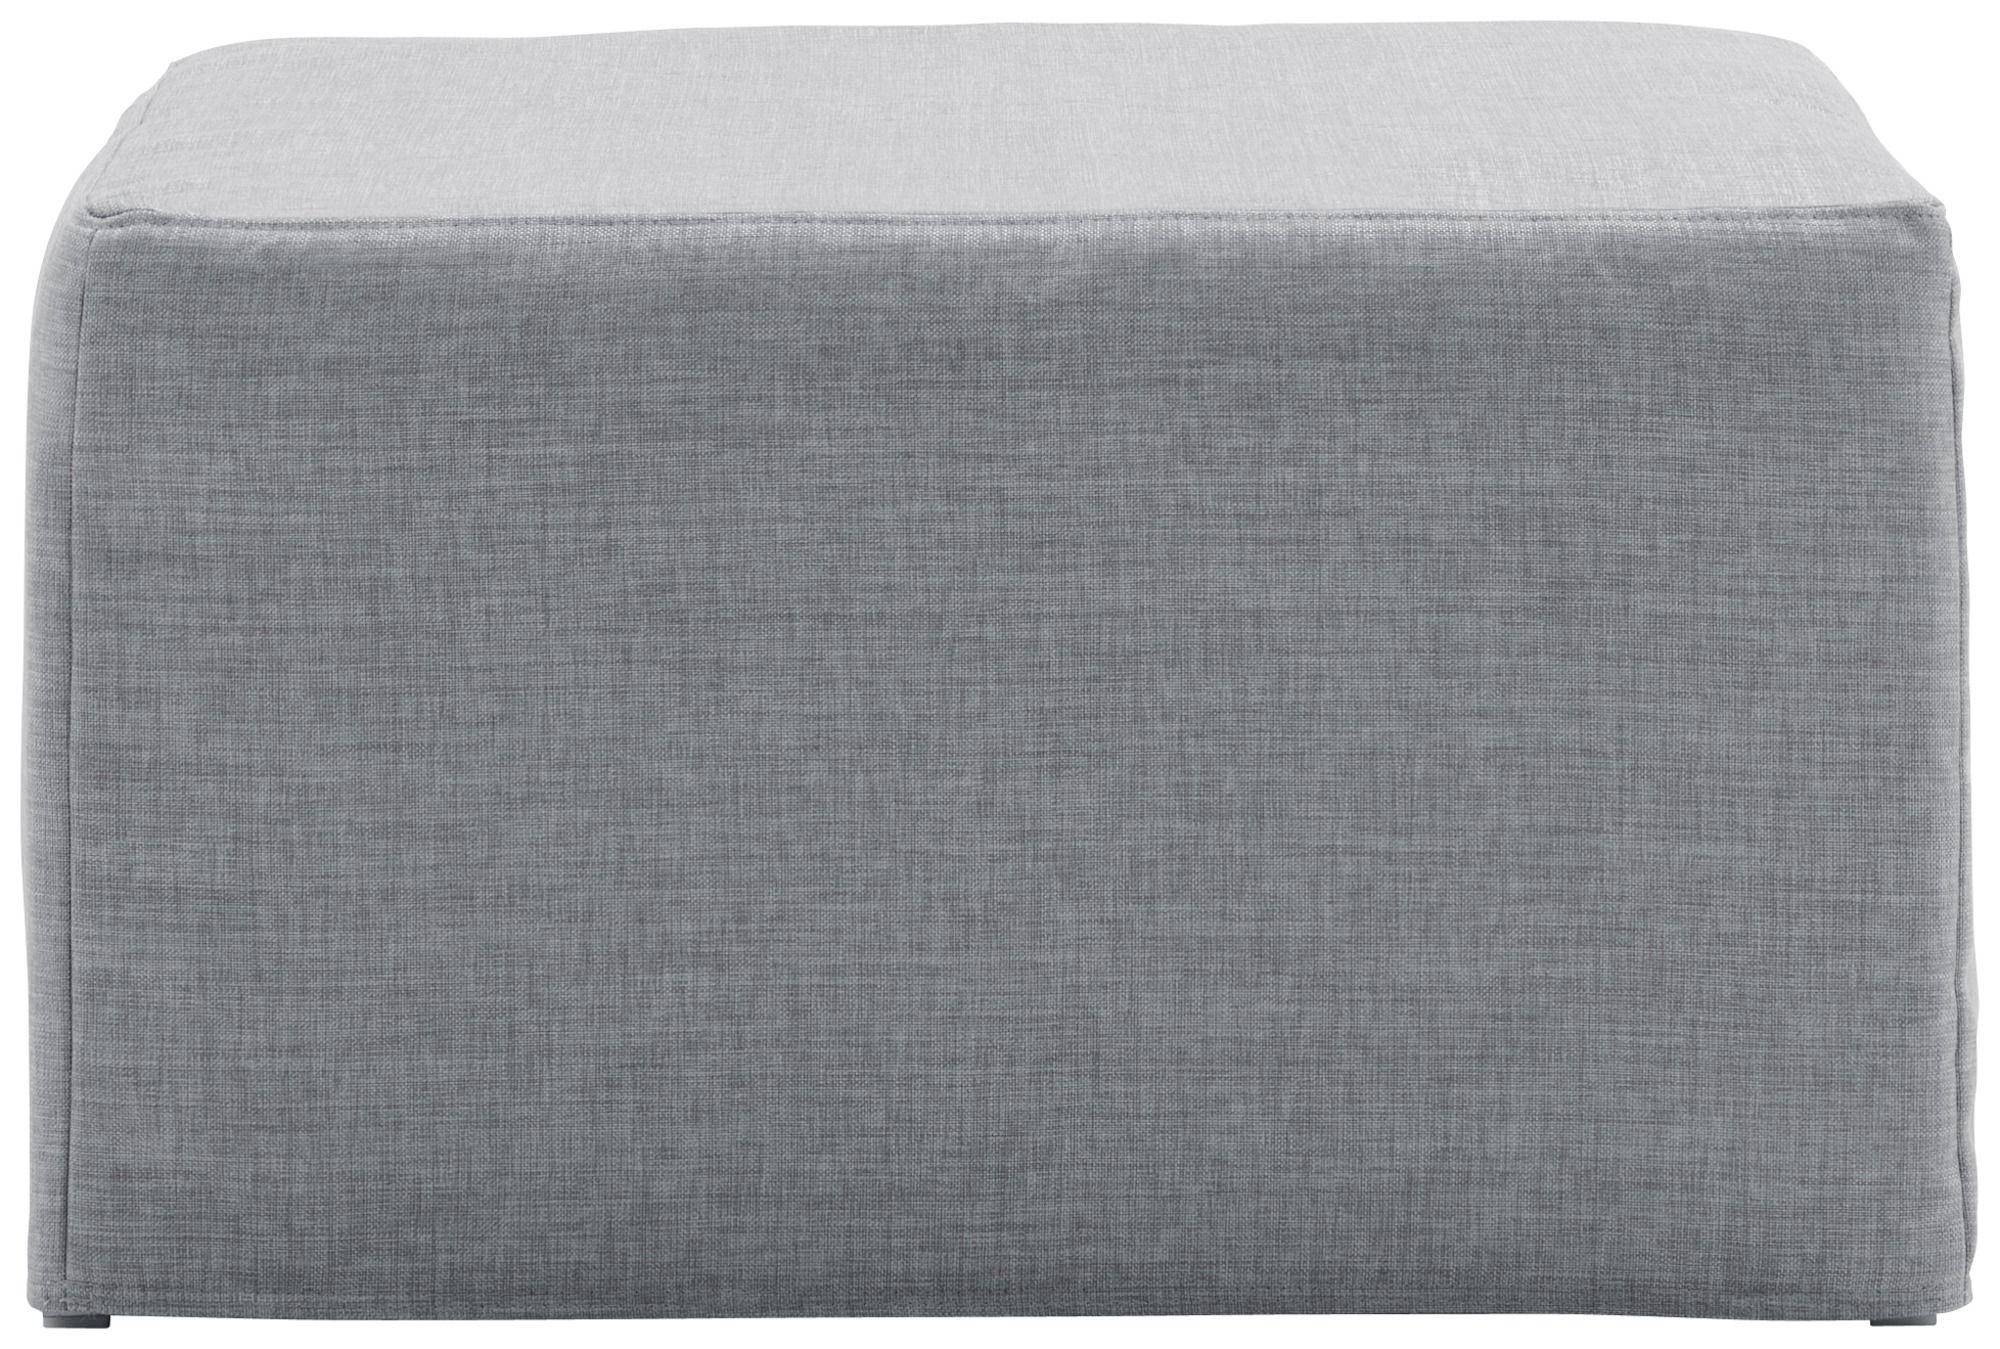 hocker mit schlaffunktion 446 hochwertige design hocker online kaufen boconcept. Black Bedroom Furniture Sets. Home Design Ideas